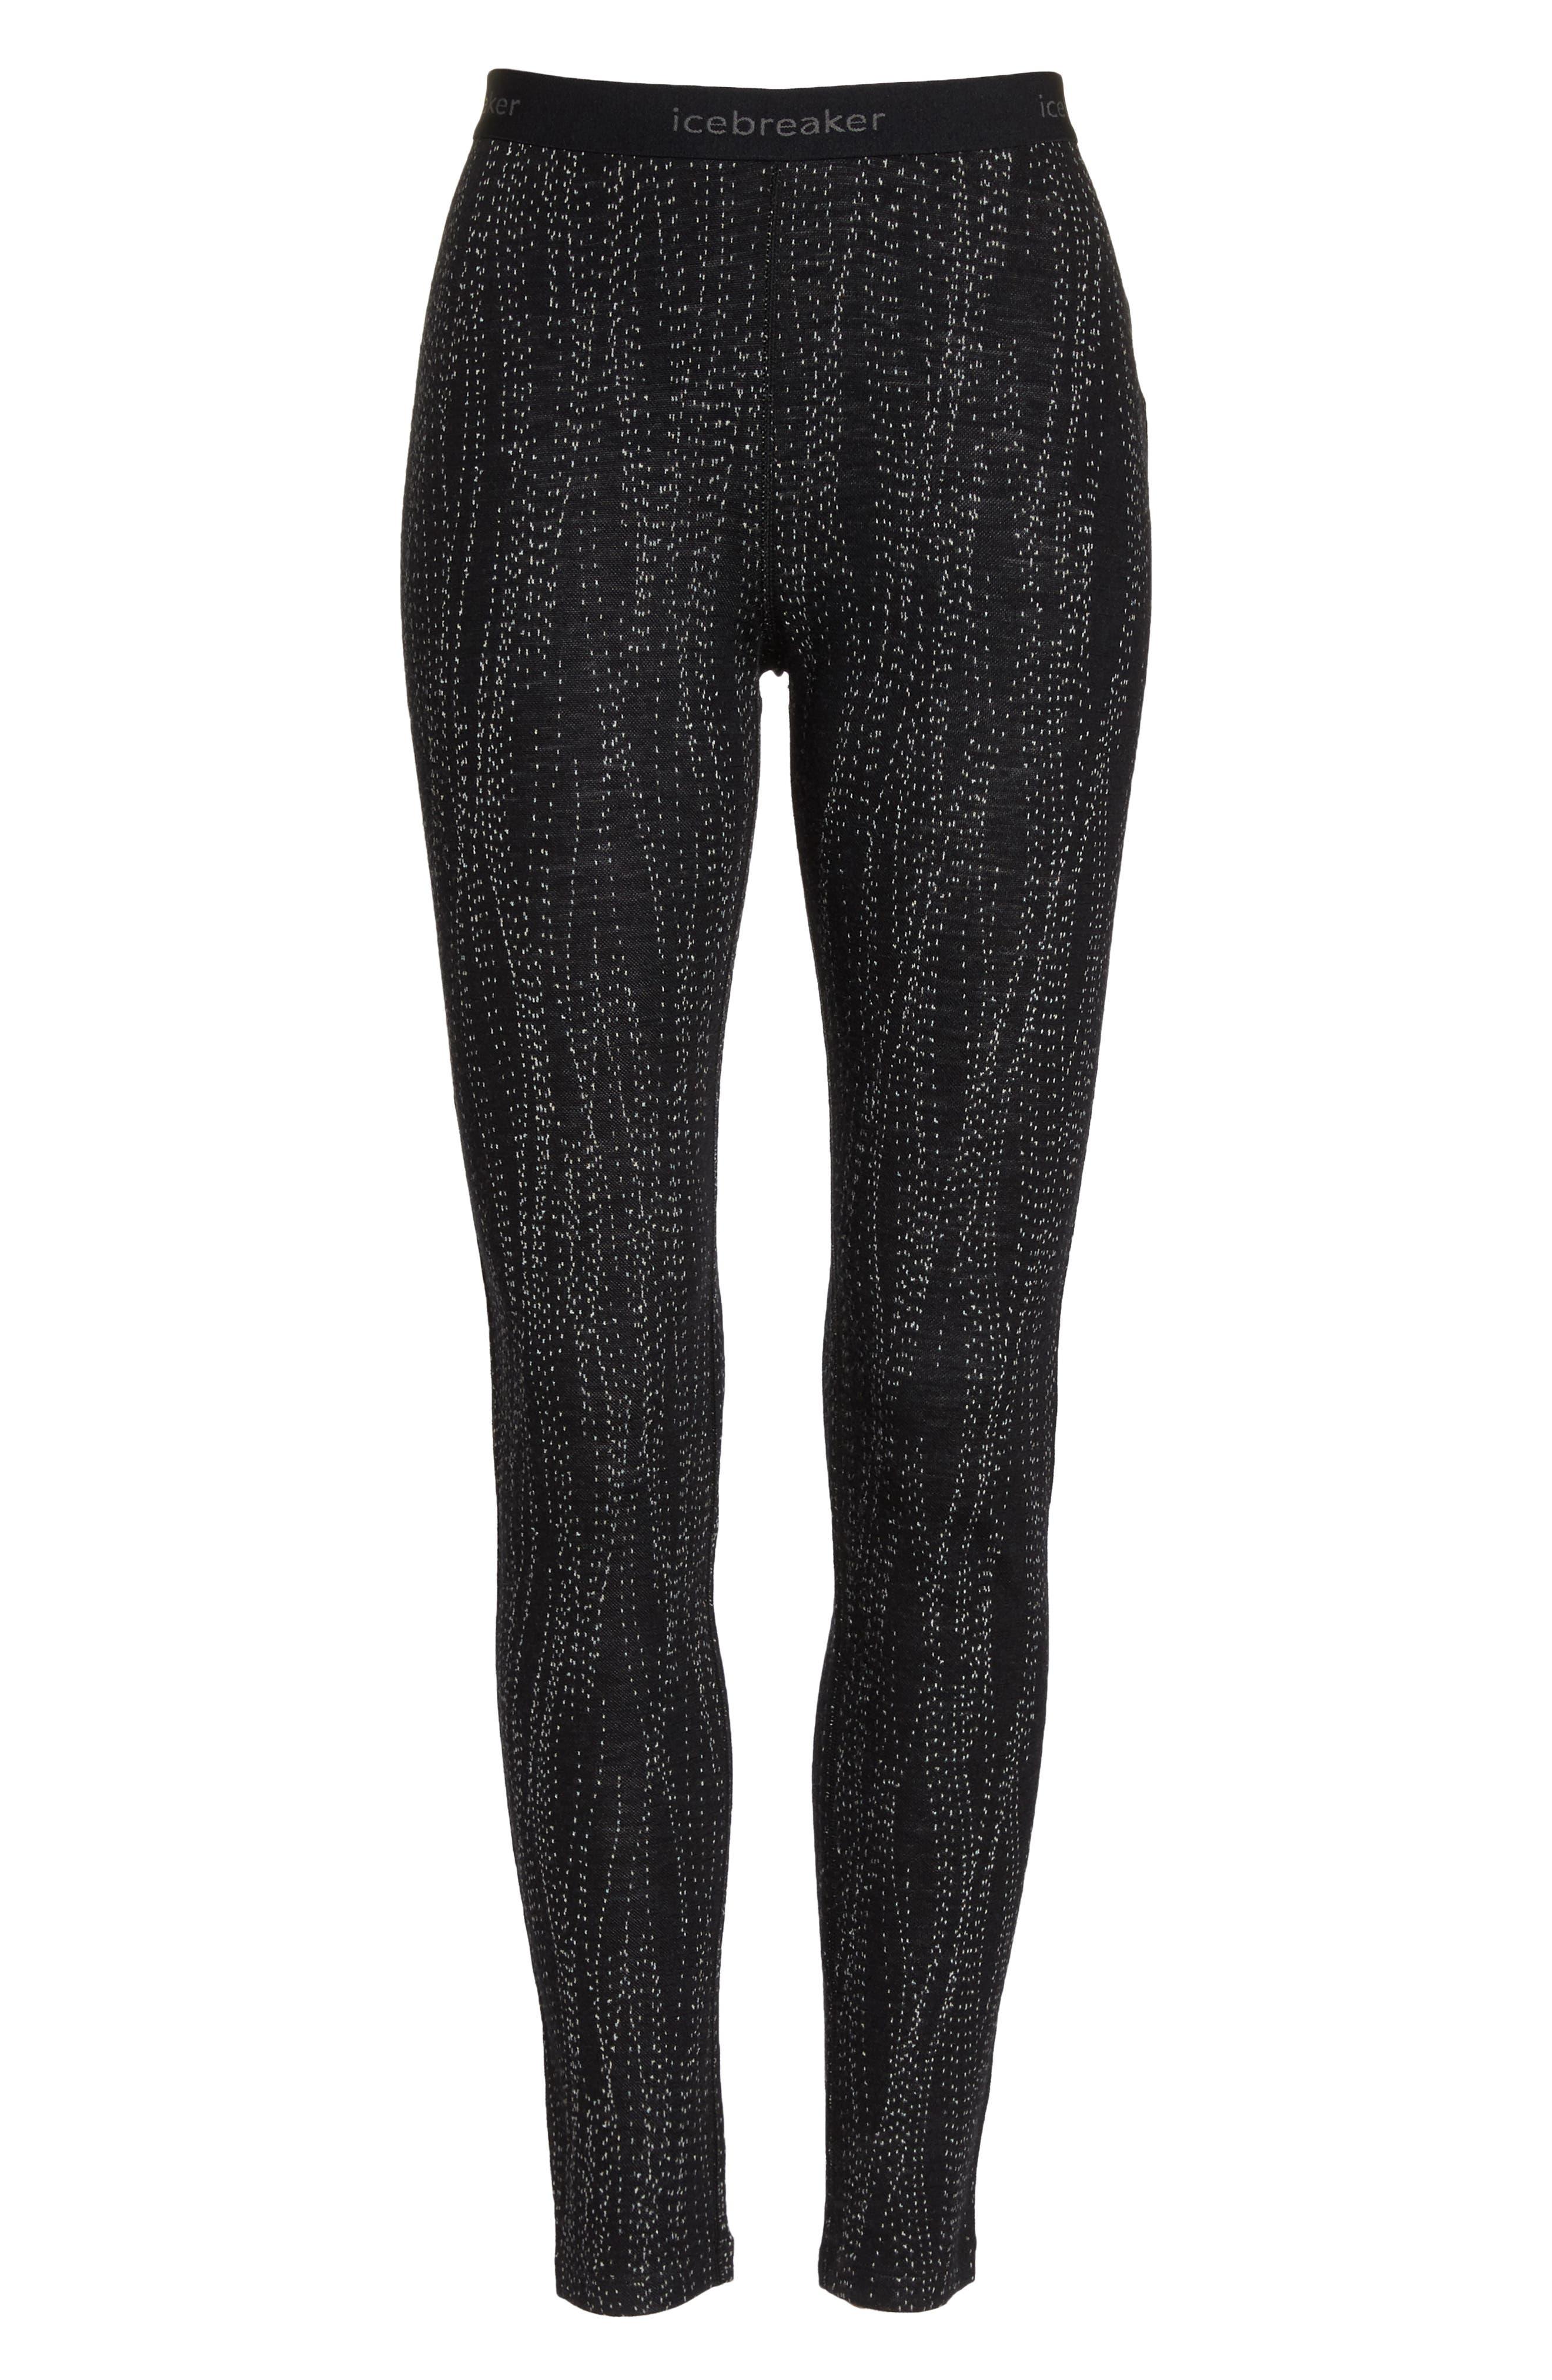 250 Vertex Merino Wool Base Layer Leggings,                             Alternate thumbnail 7, color,                             BLACK/ SNOW